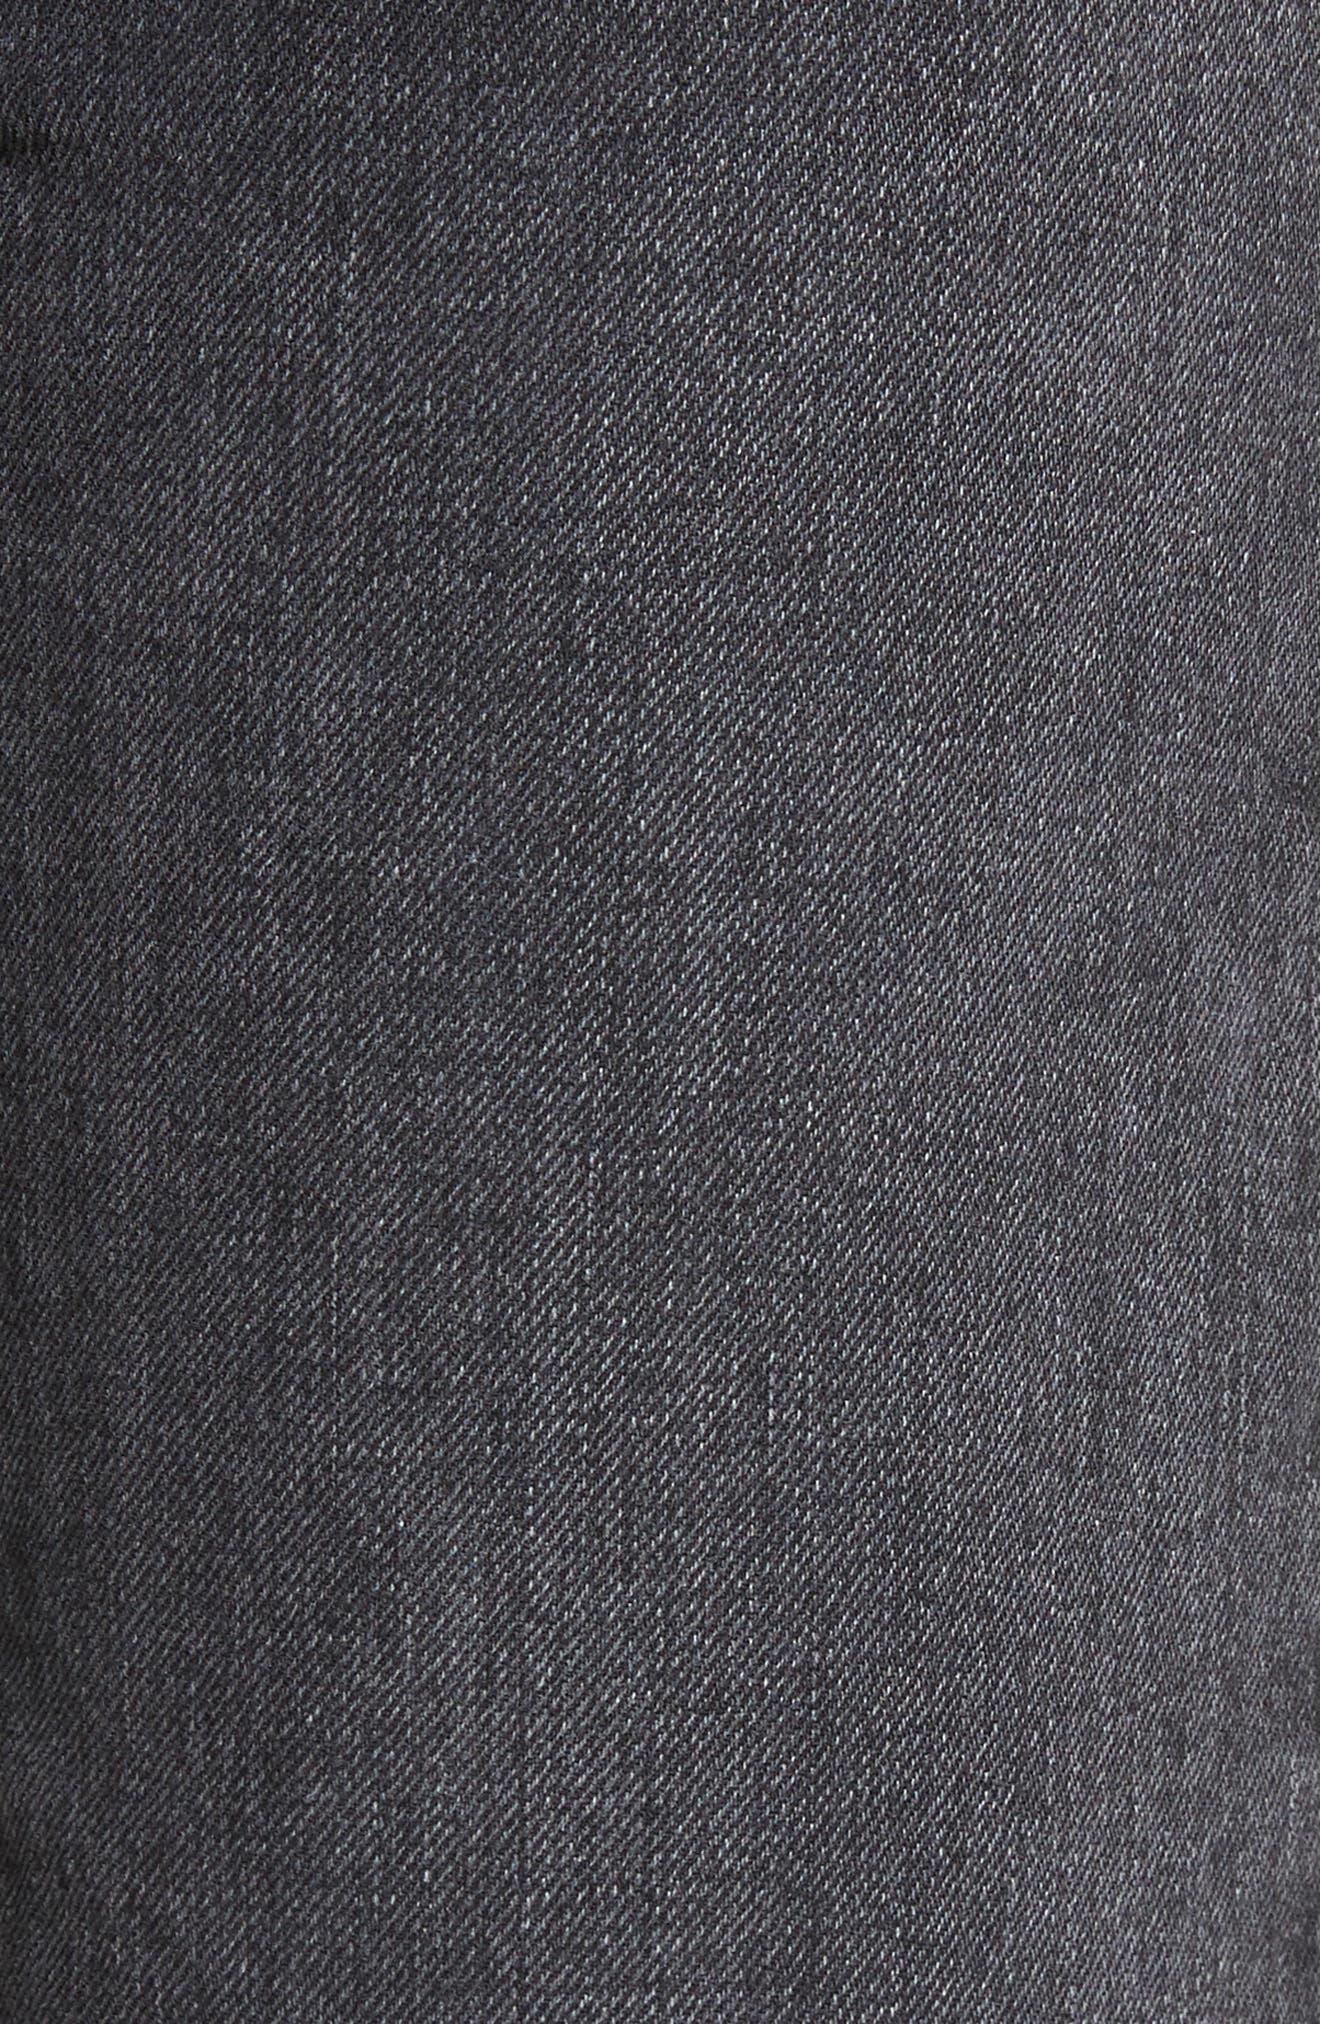 Tilson Crop Frayed Wide Leg Jeans,                             Alternate thumbnail 5, color,                             001